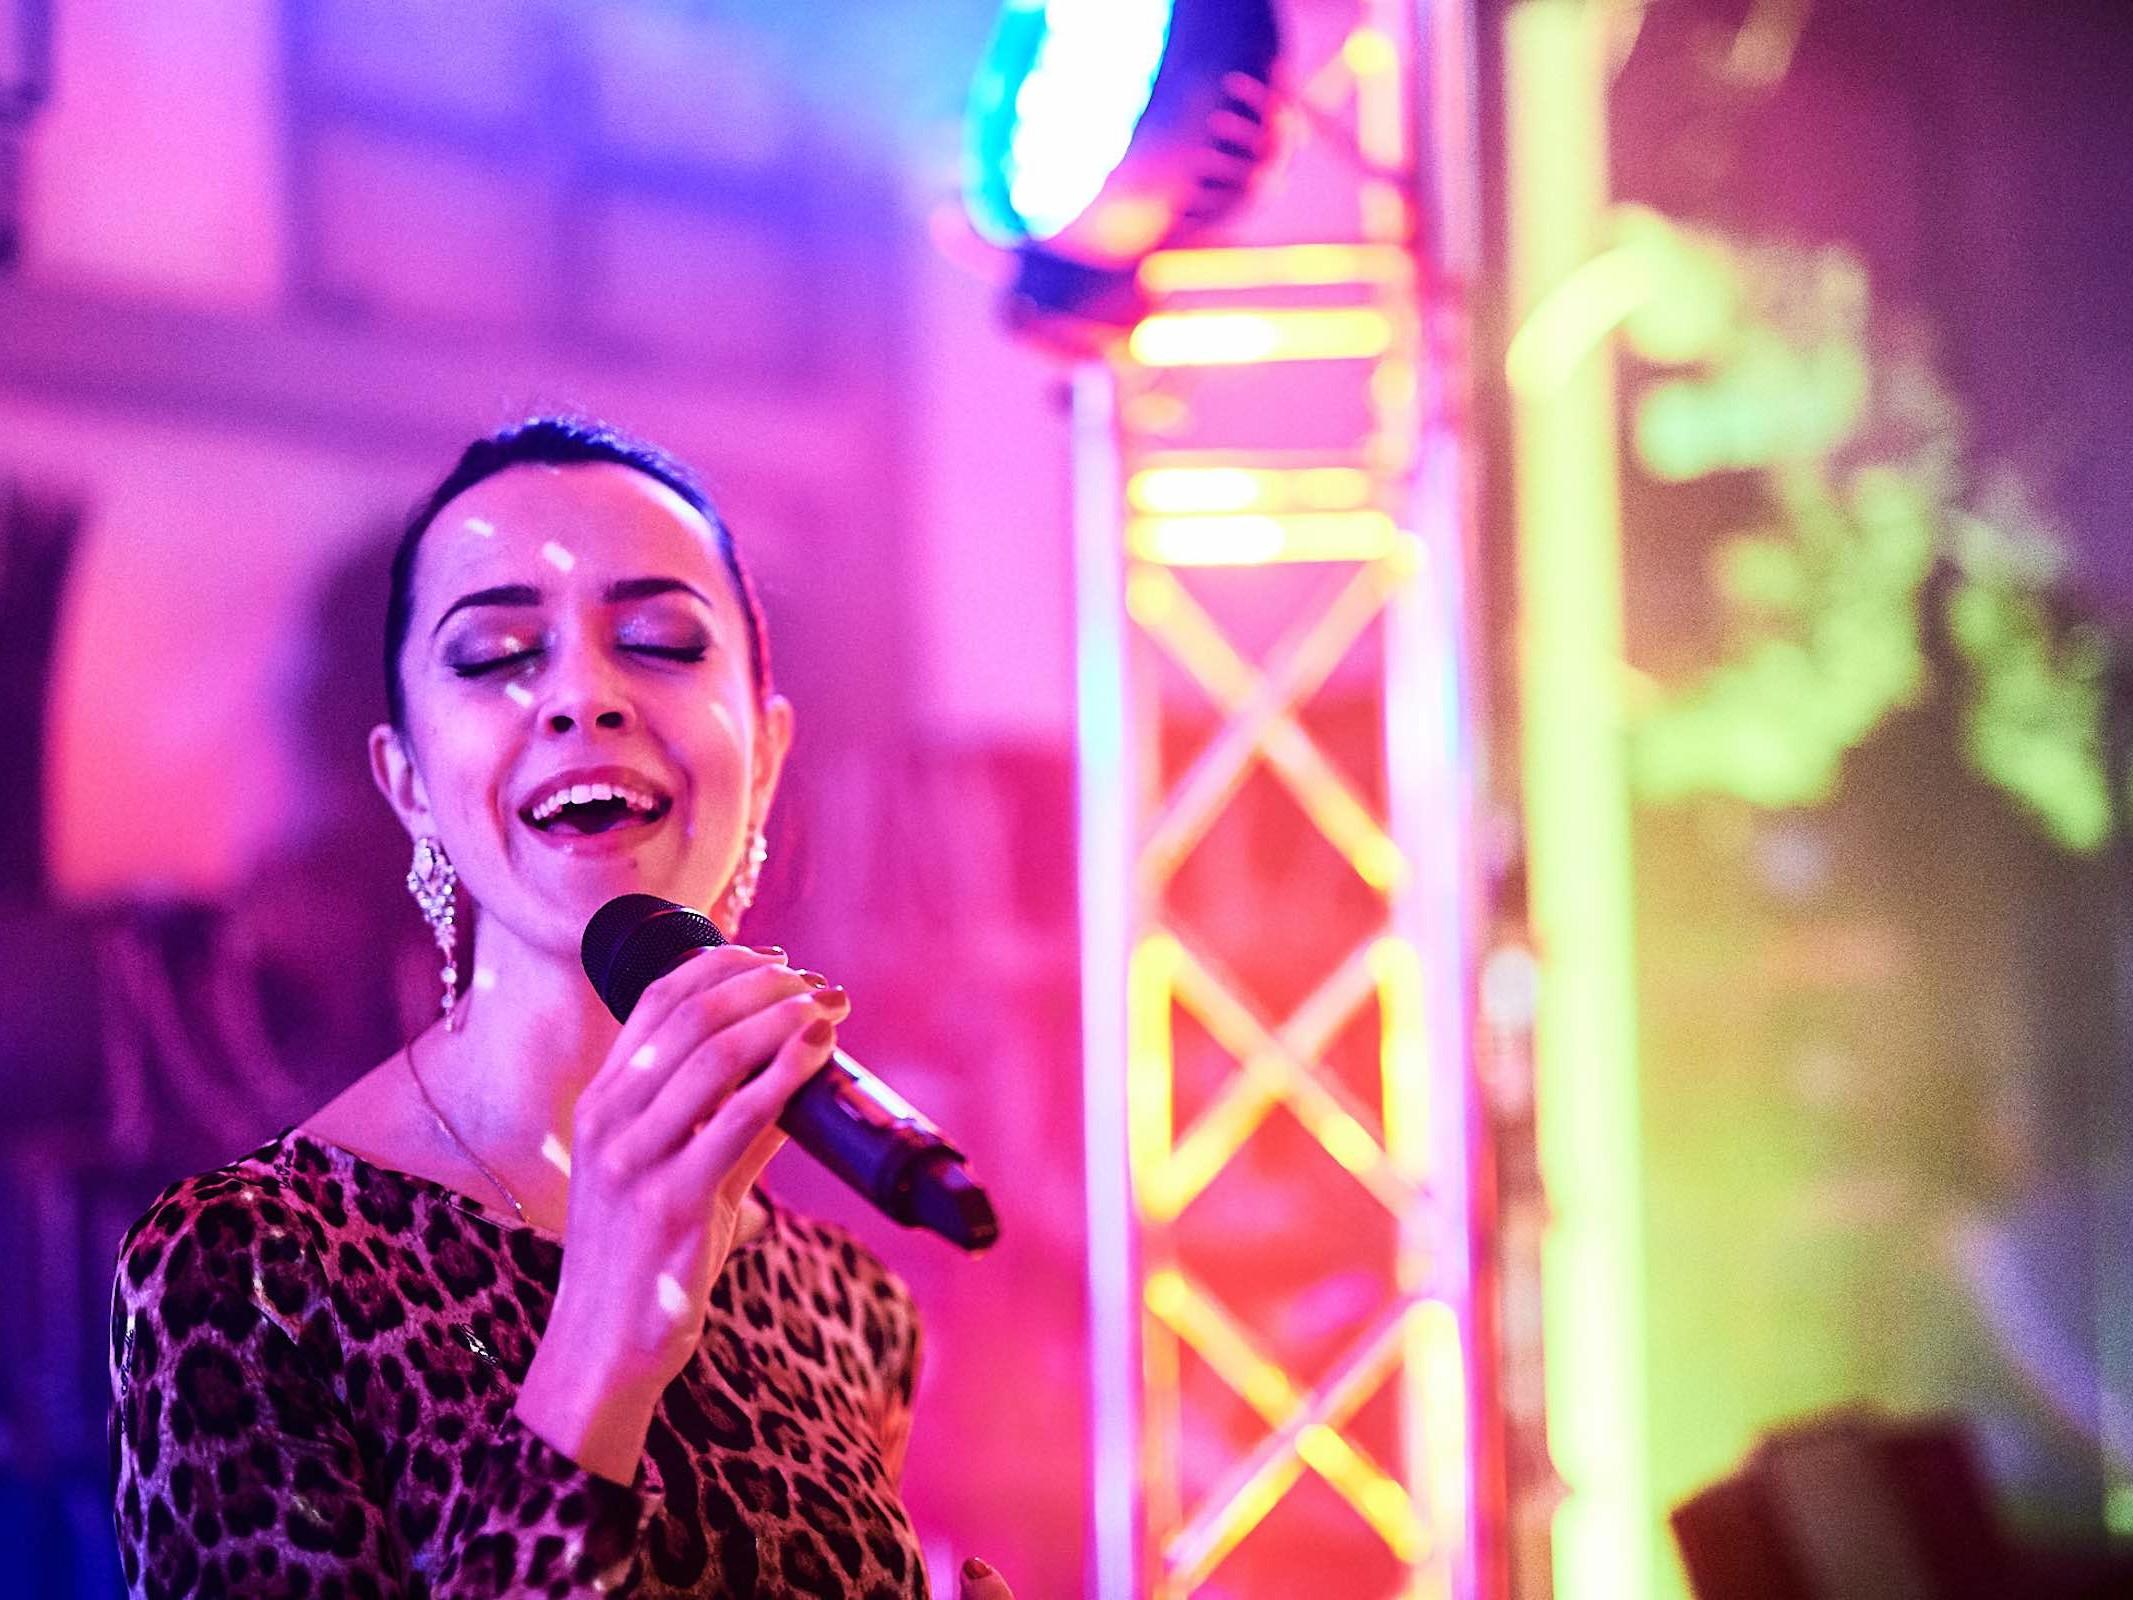 DJANE | DJ | Hannover | Saxophonist | Moderation | Gesang | Saxophon | DJ | Plus | Combo | Percussion | Schlagzeug | Sängering | Buchen | Mieten | Anfragen | Hochzeit | Messeparty | Event | Gala | Charity